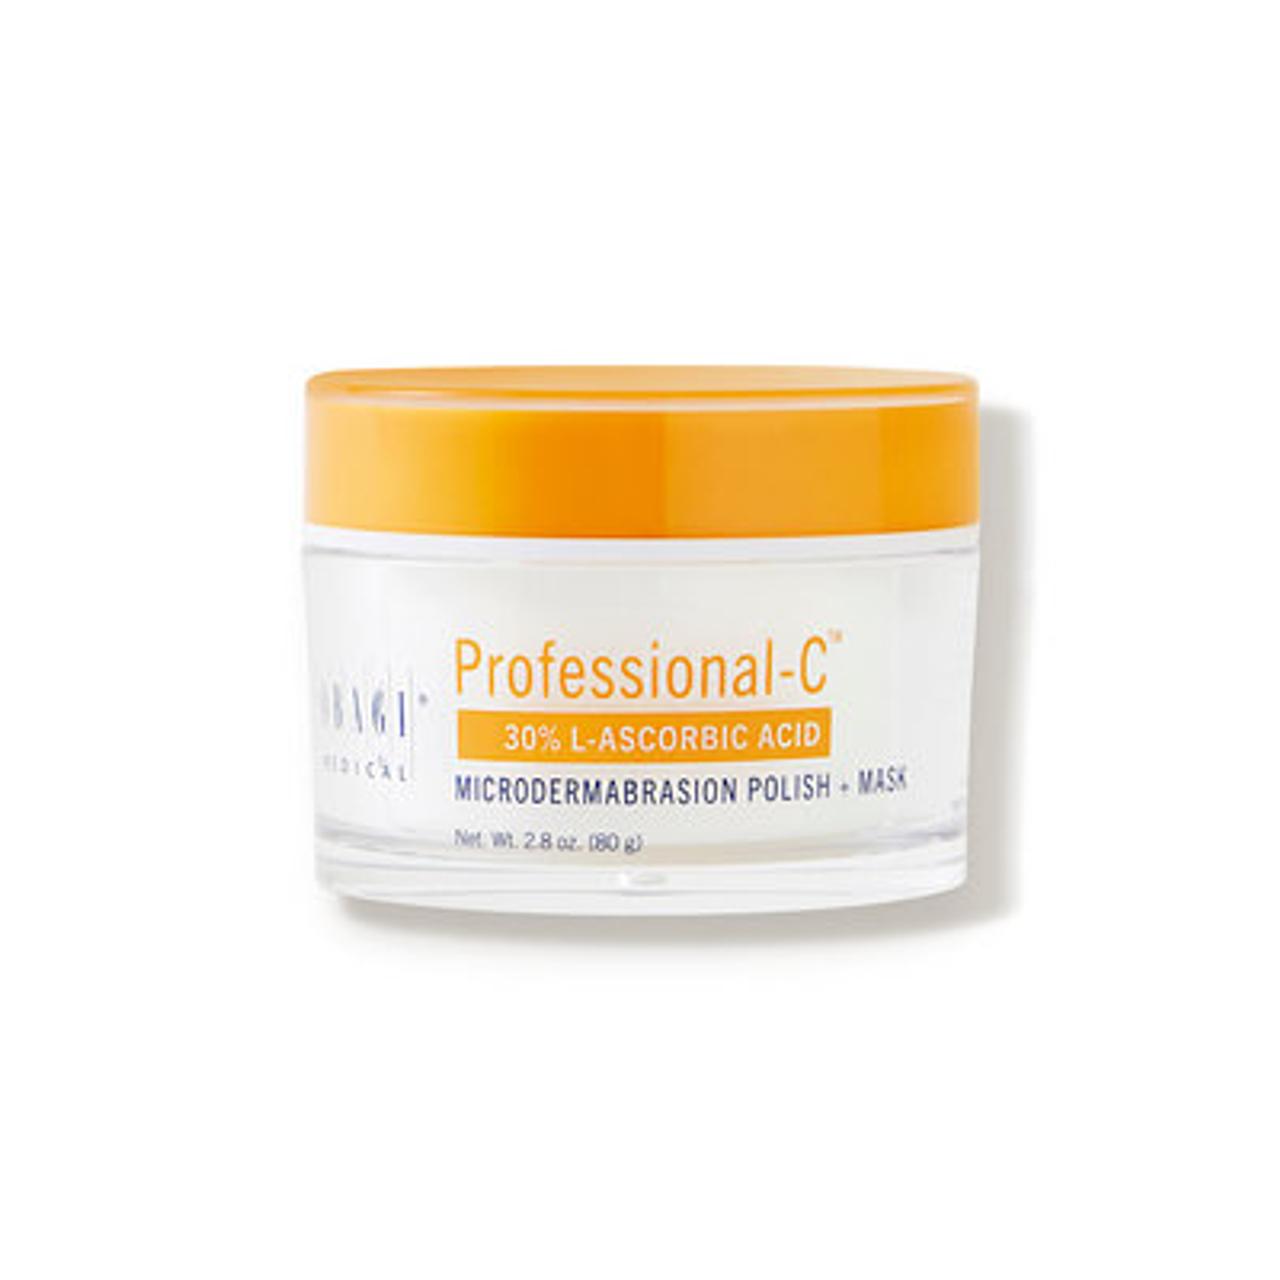 Pro-C Microderm Polish & Mask